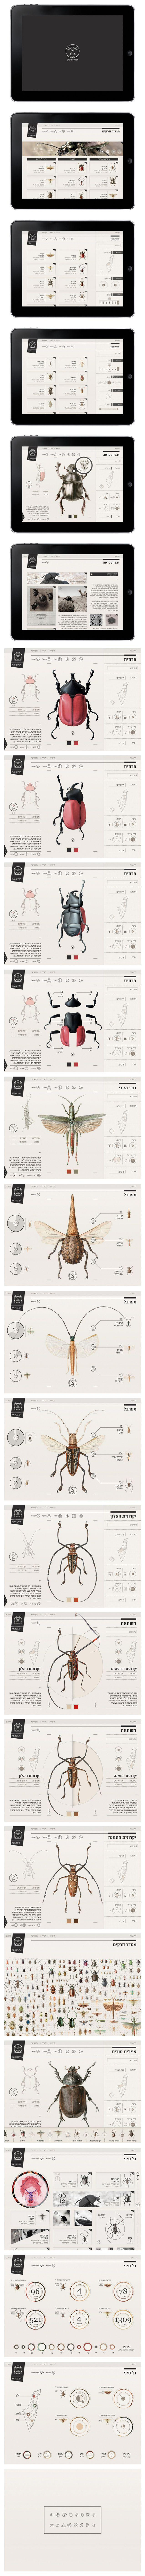 http://www.behance.net/gallery/Insect-Definer/8164527